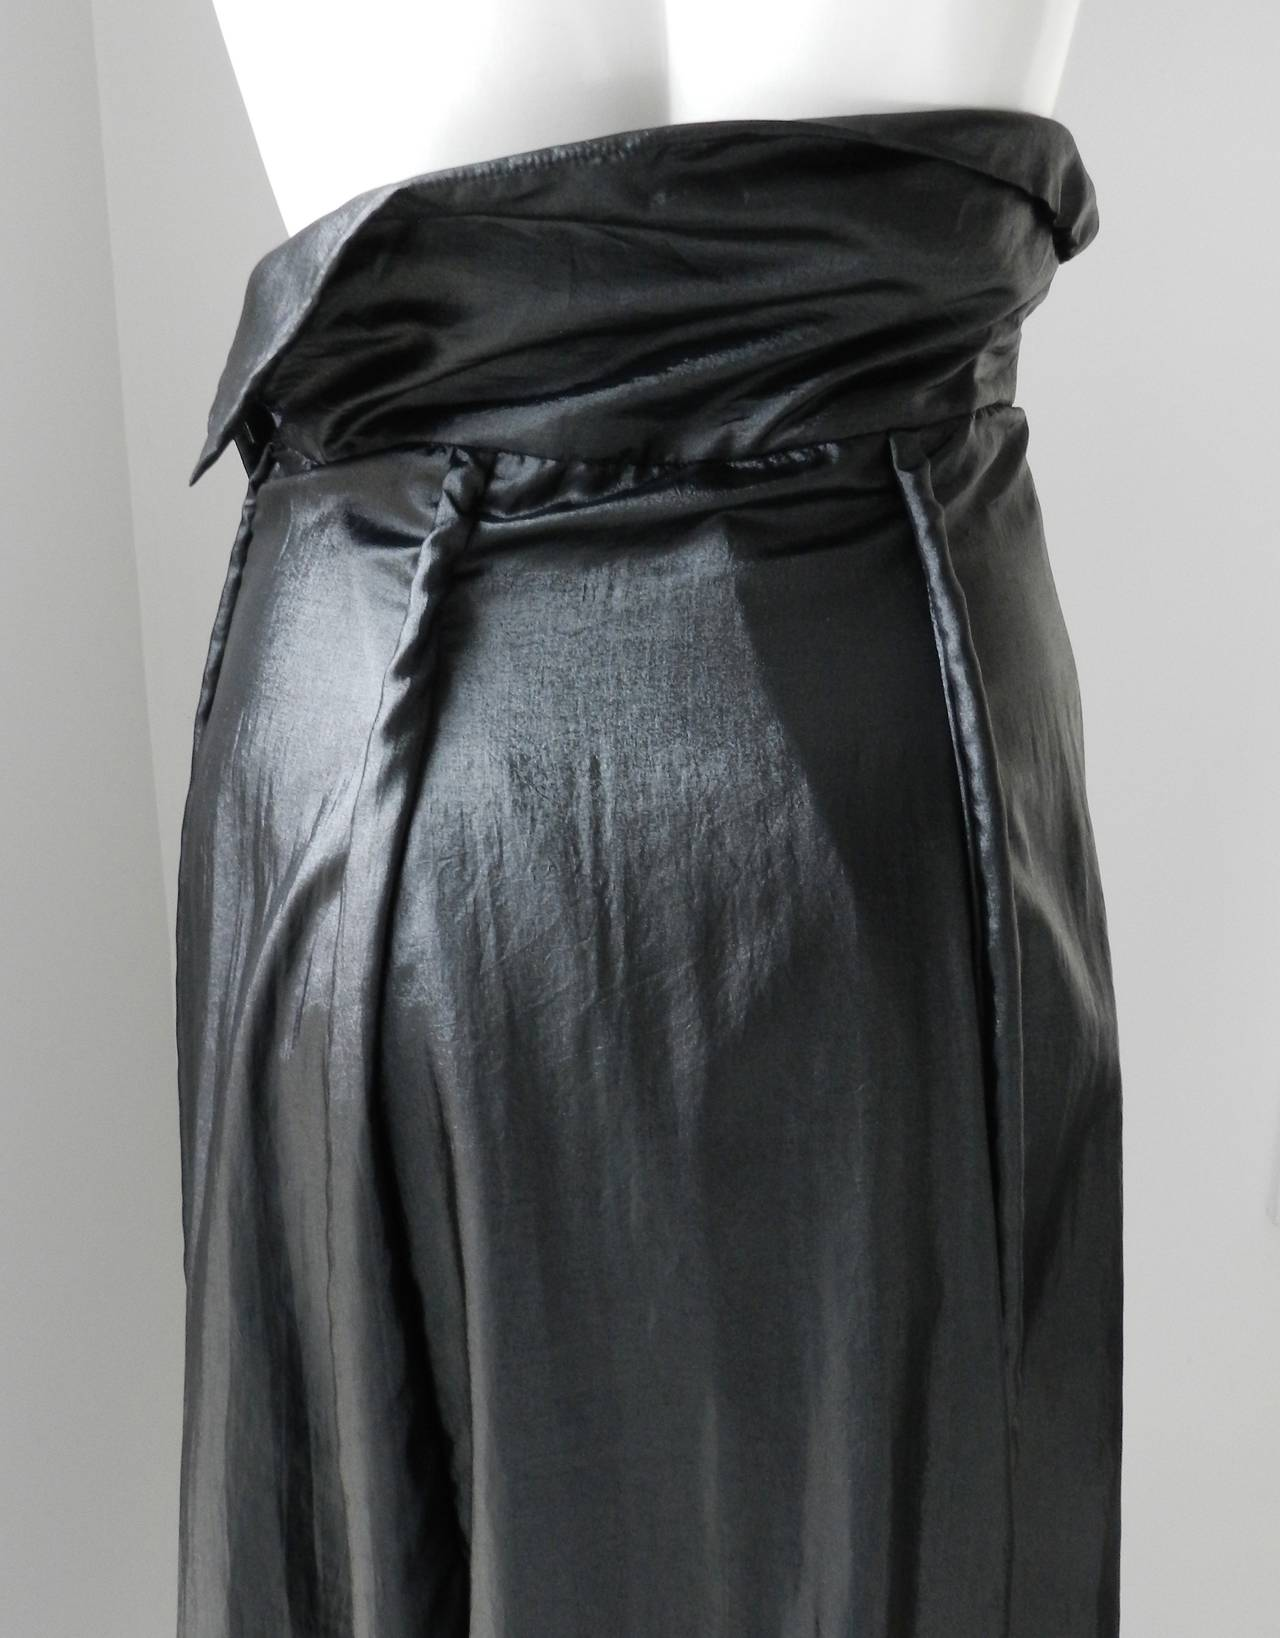 Issey Miyake Long Black Shiny Skirt 6